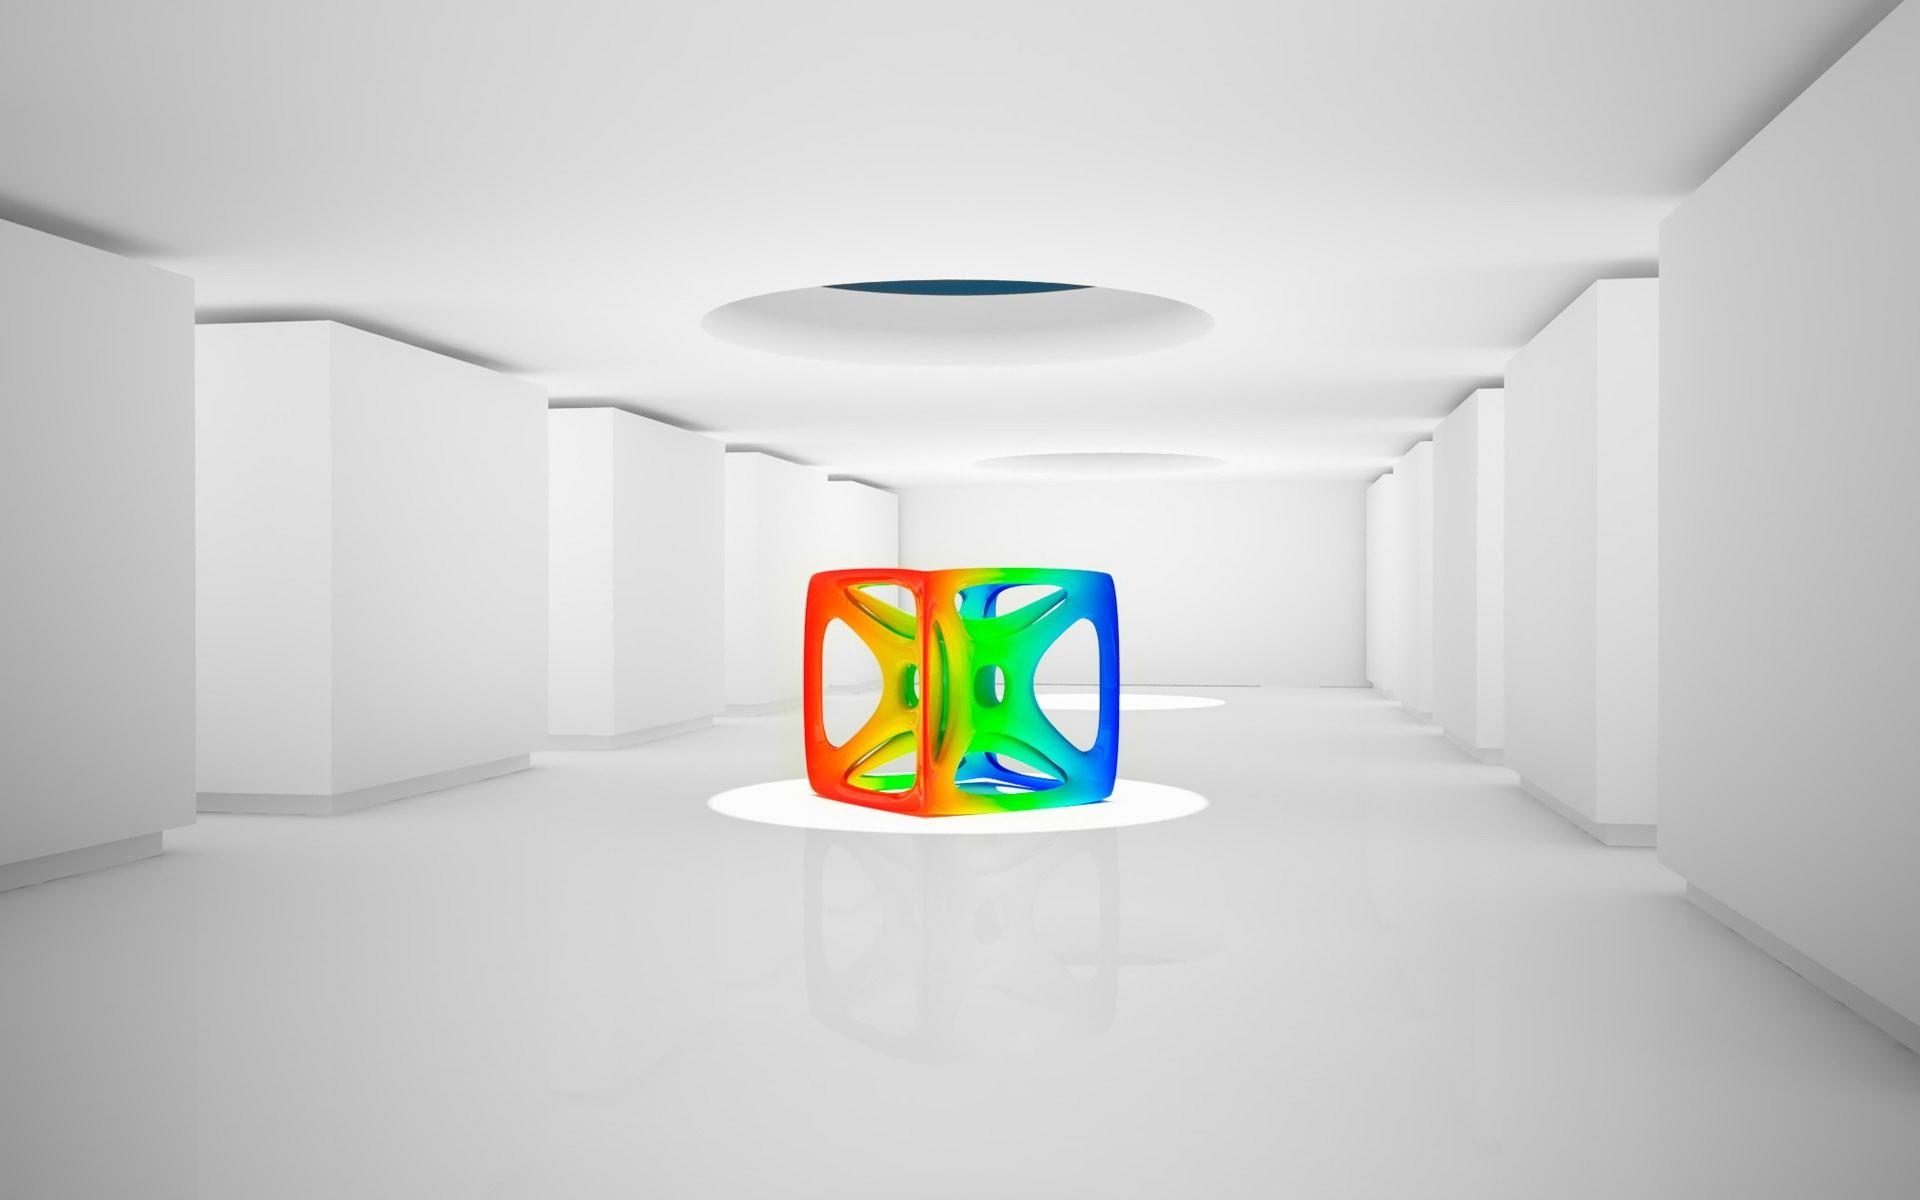 Matrix 3d Cube 3 Fondo De Pantalla Animado Hd Para: Cubo Fondo De Pantalla HD